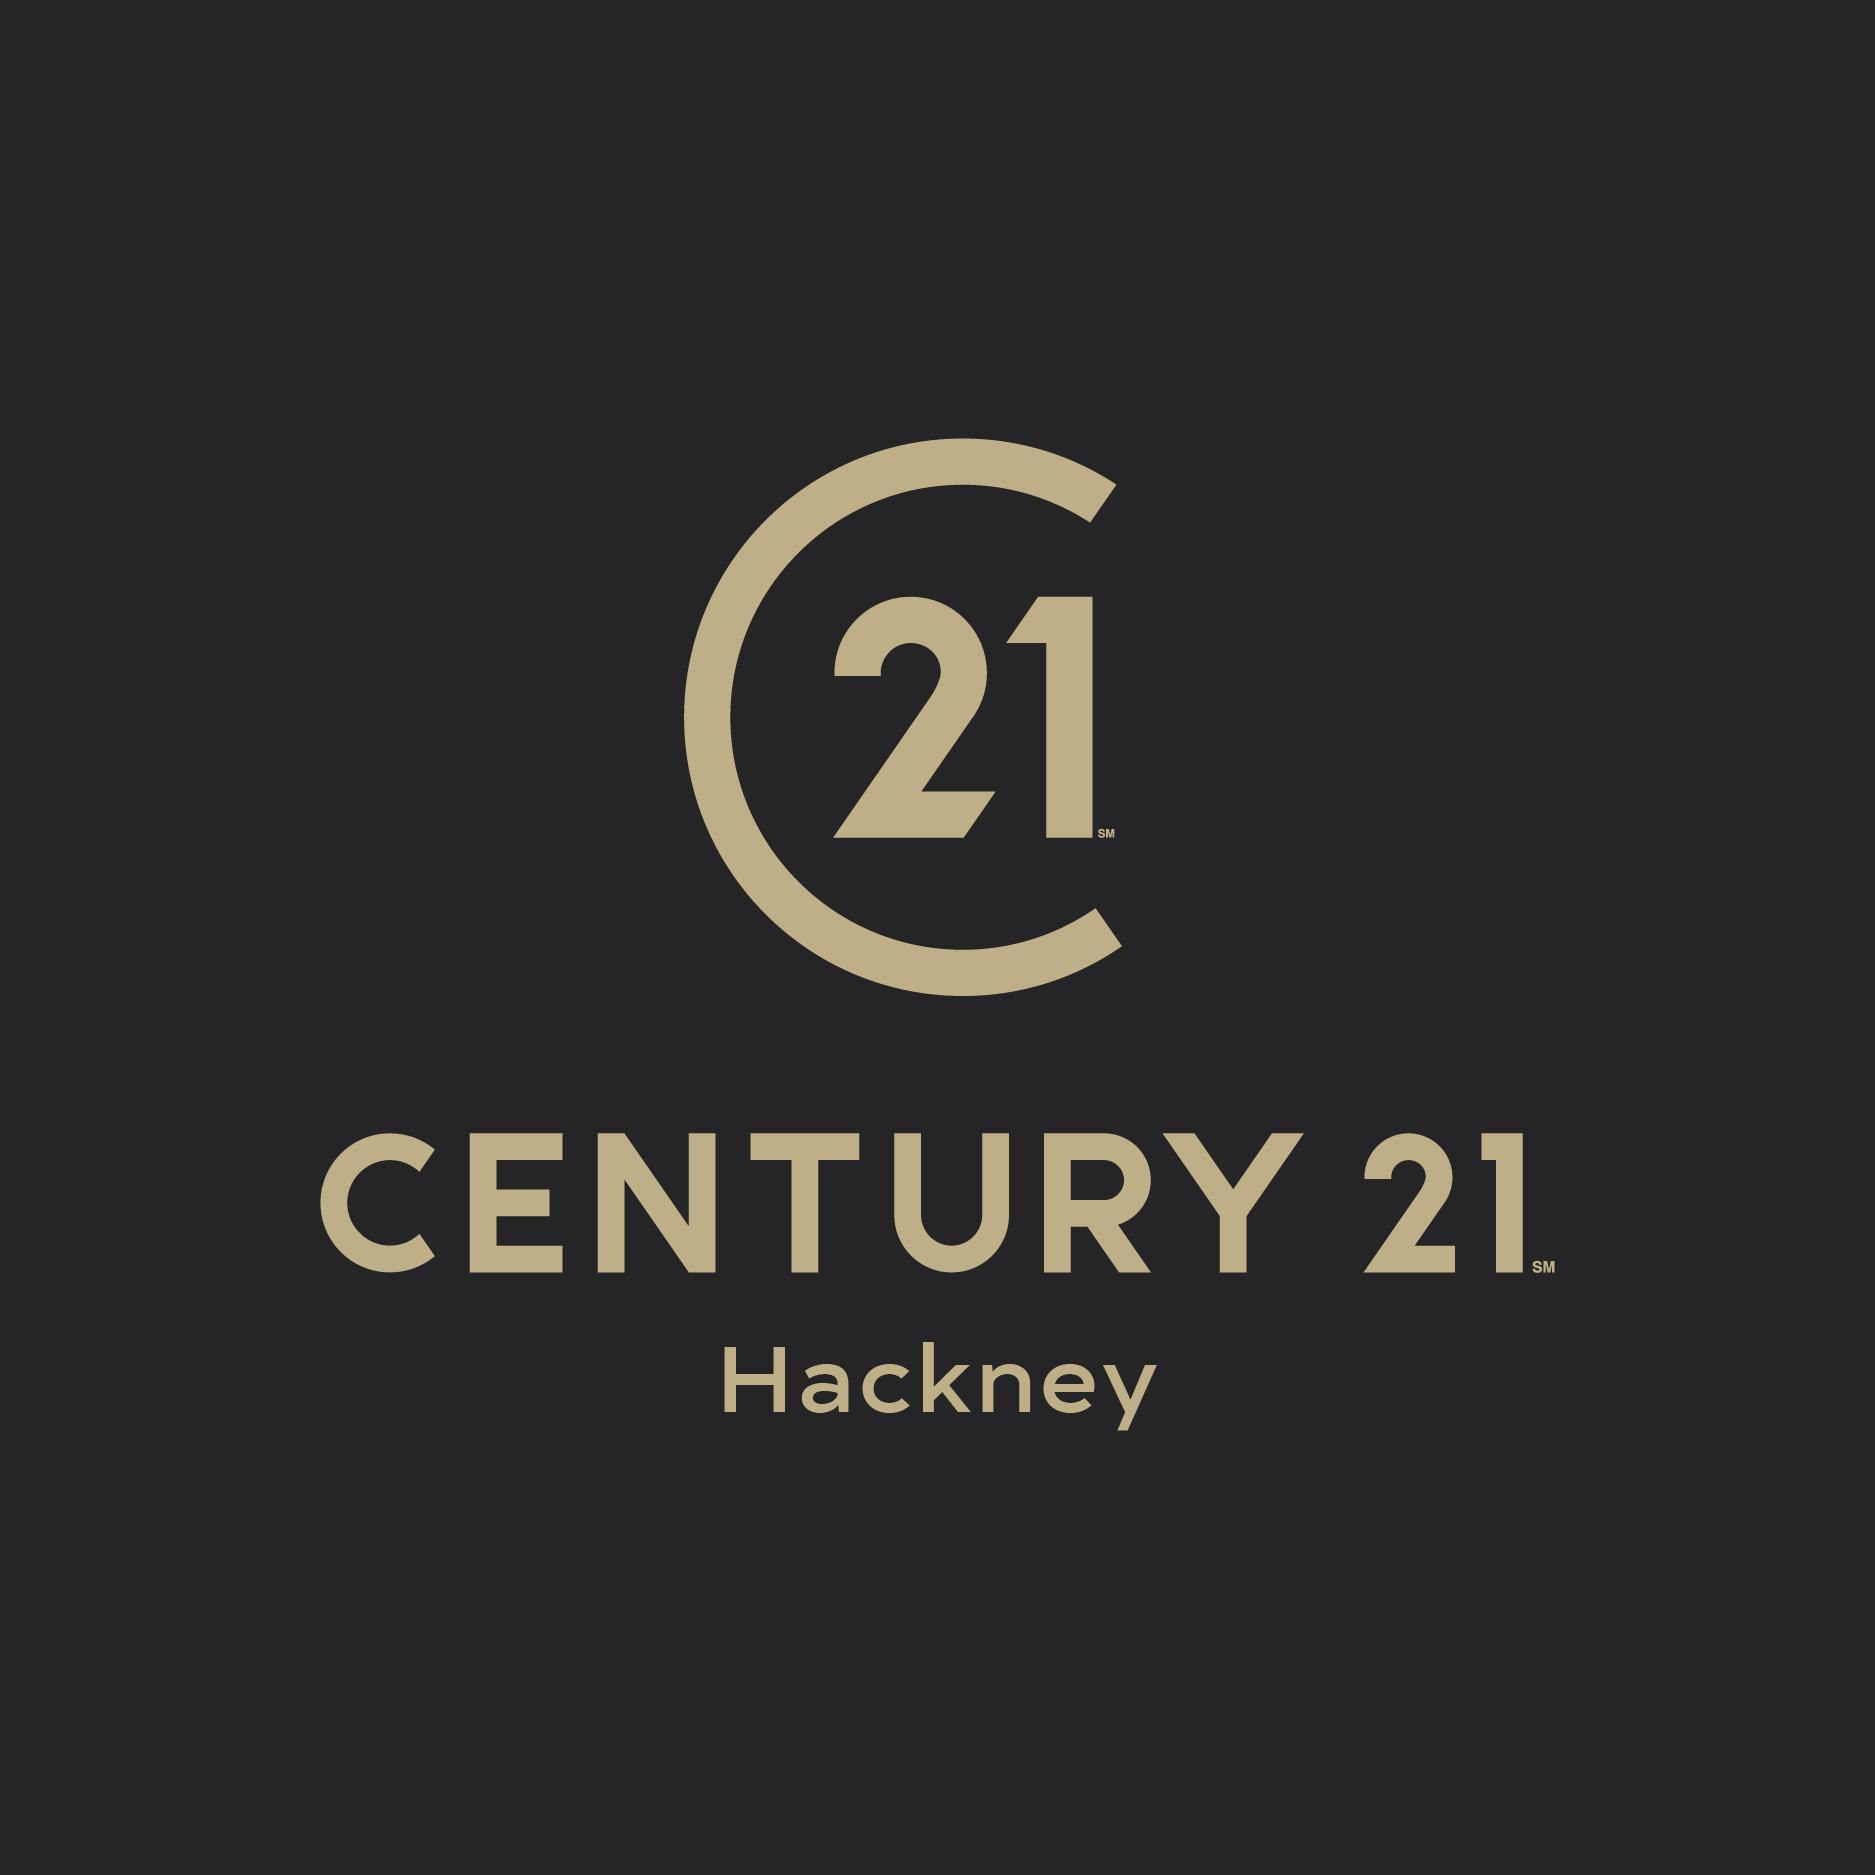 Century 21 - Hackney